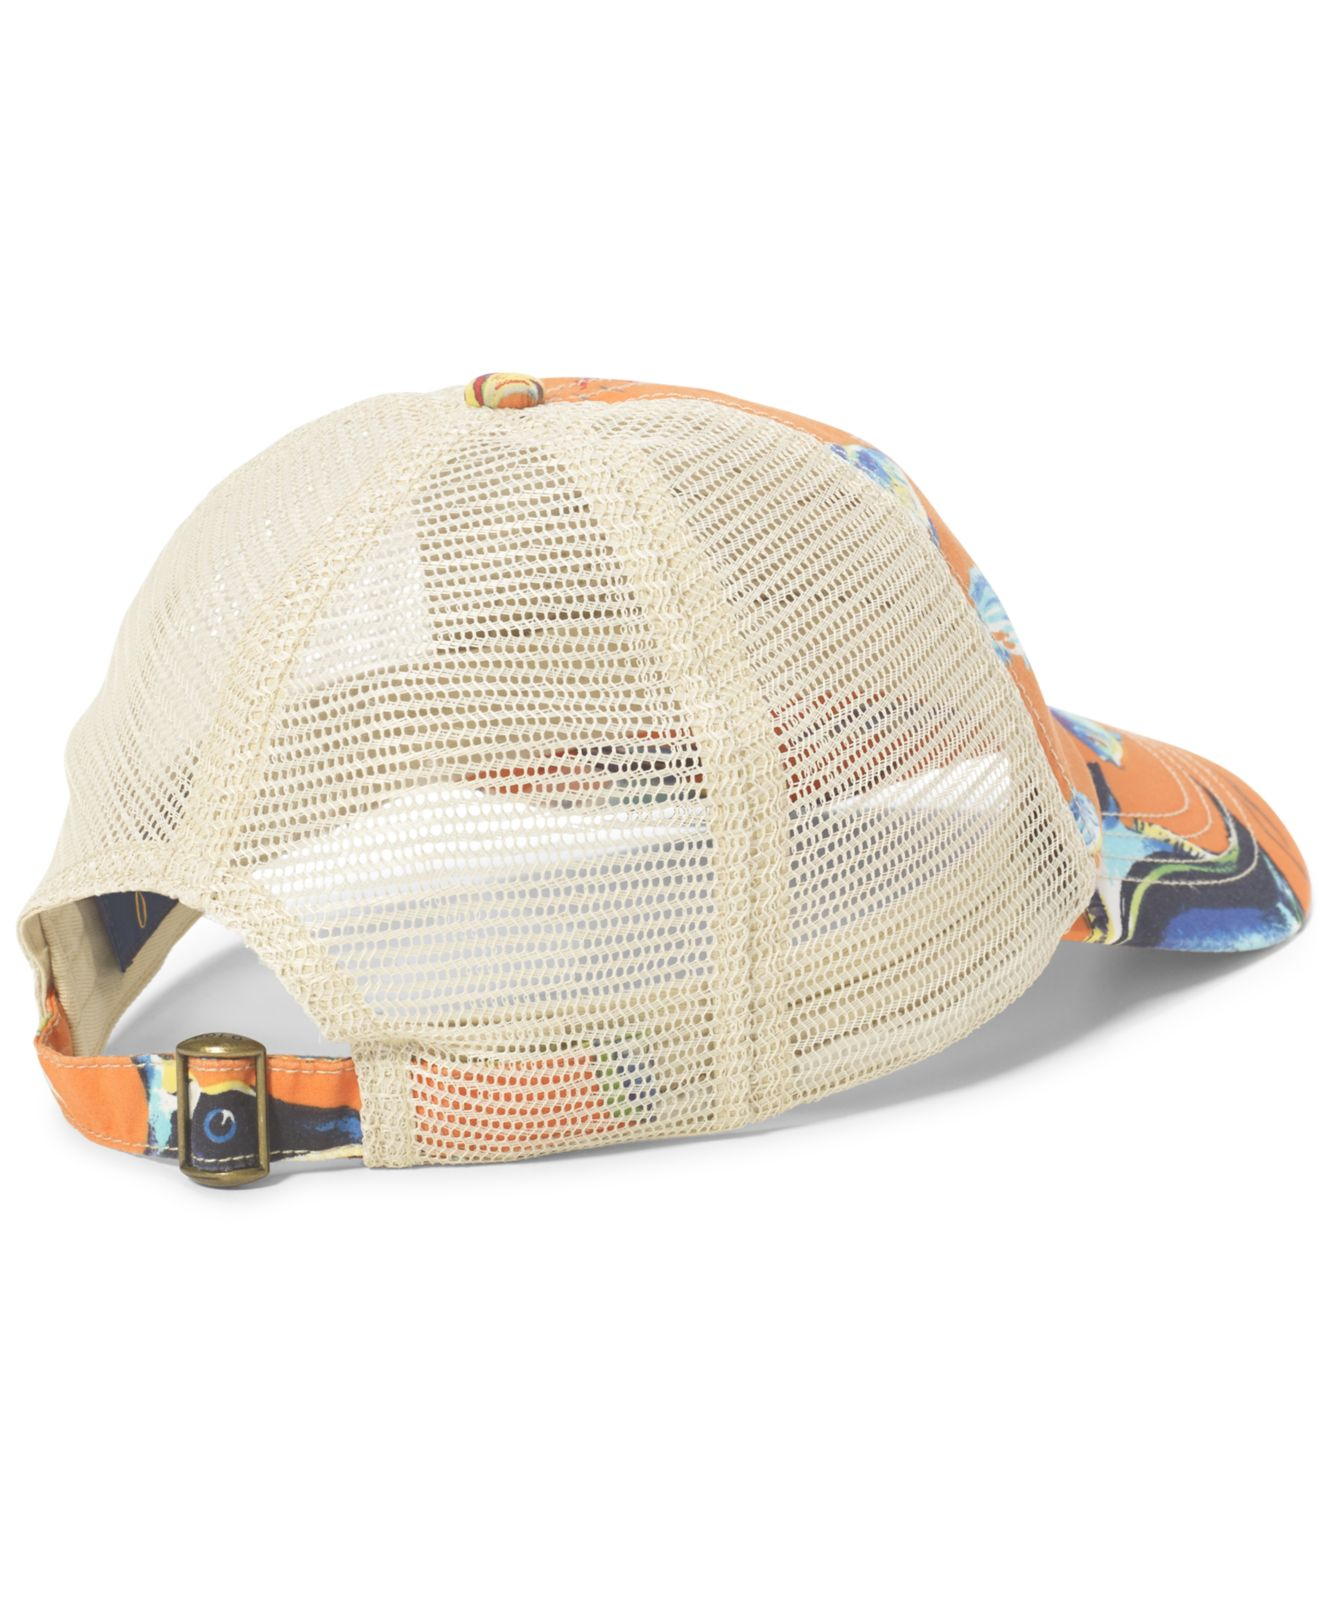 Polo ralph lauren angelfish print trucker hat for men lyst for Polo fishing hat